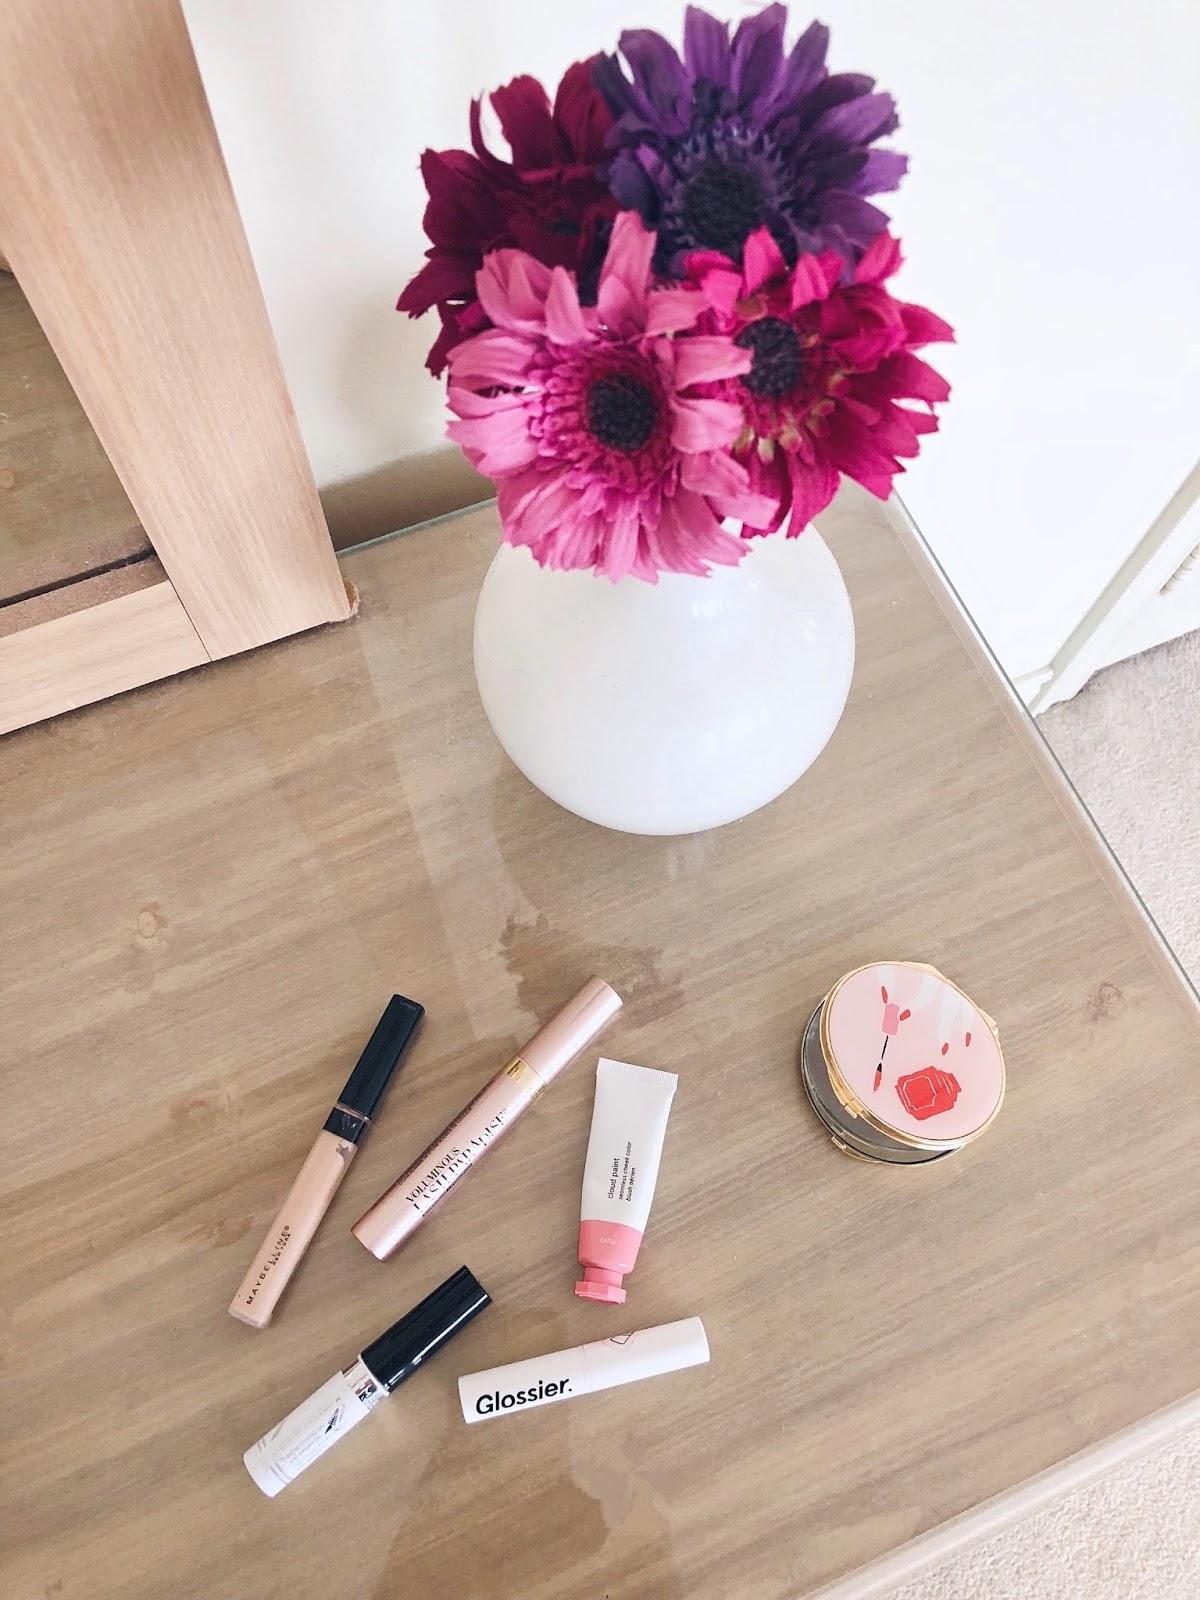 glossier cloud paint lipstick rimmel brow loreal mascara kate spade blogger maybelline concealer sephora dupe drugstore